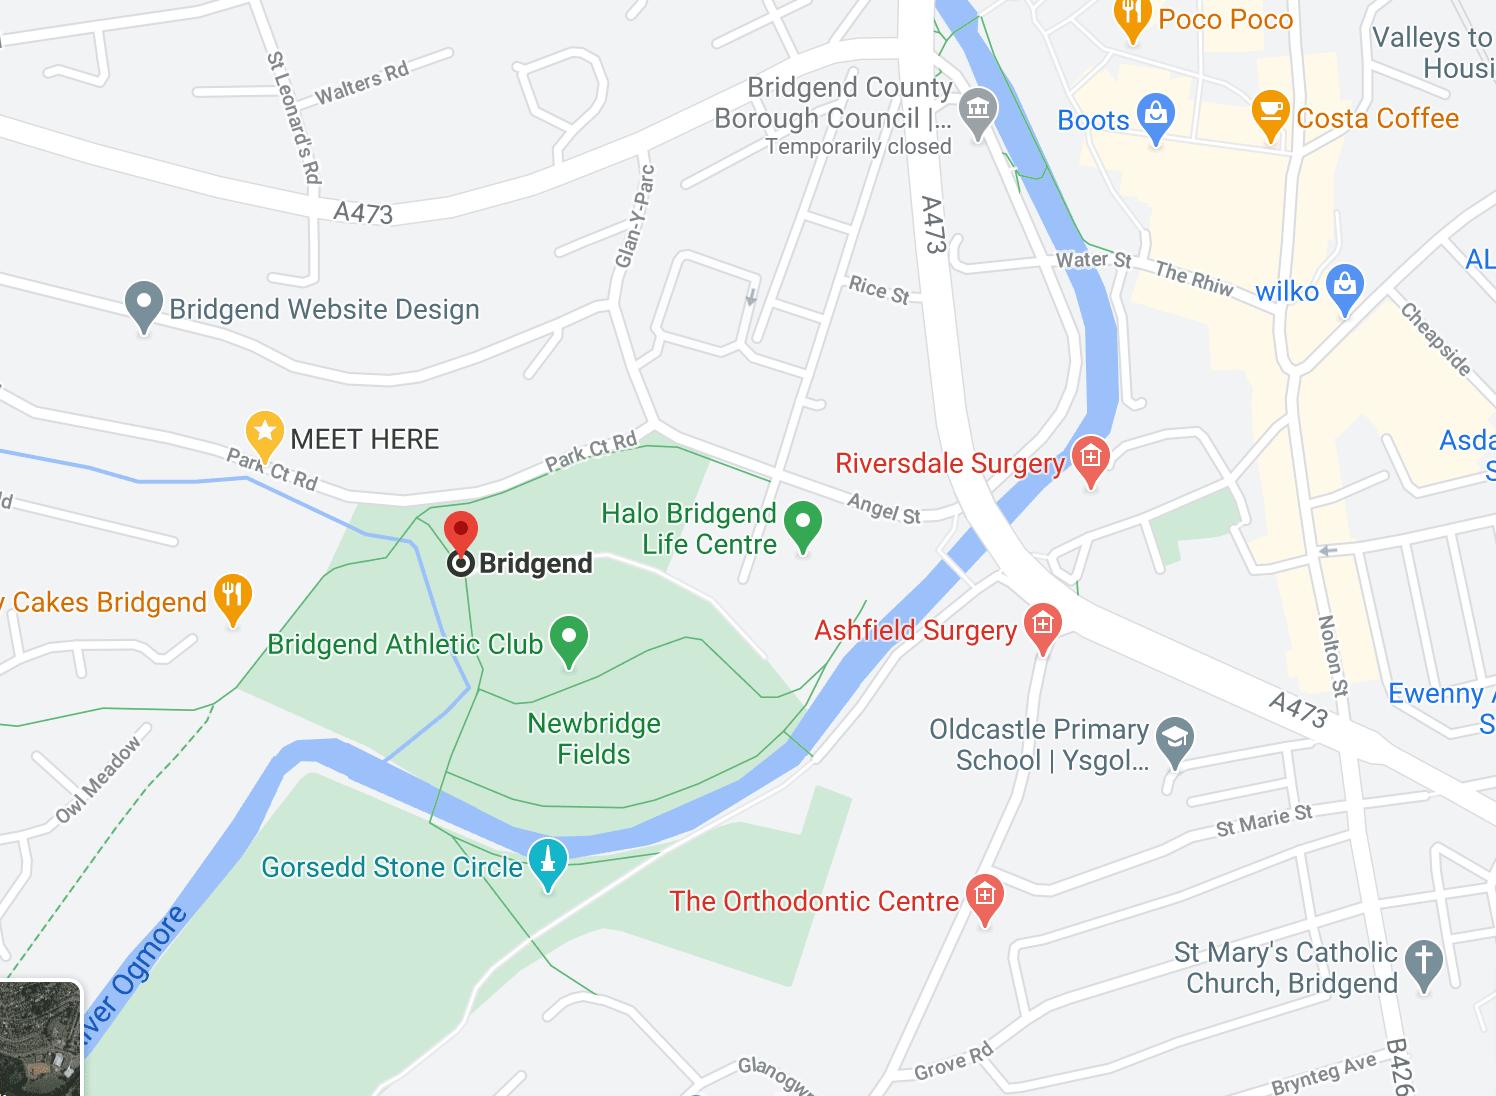 MAP NEWBRIDGE FIELDS BRIDGEND